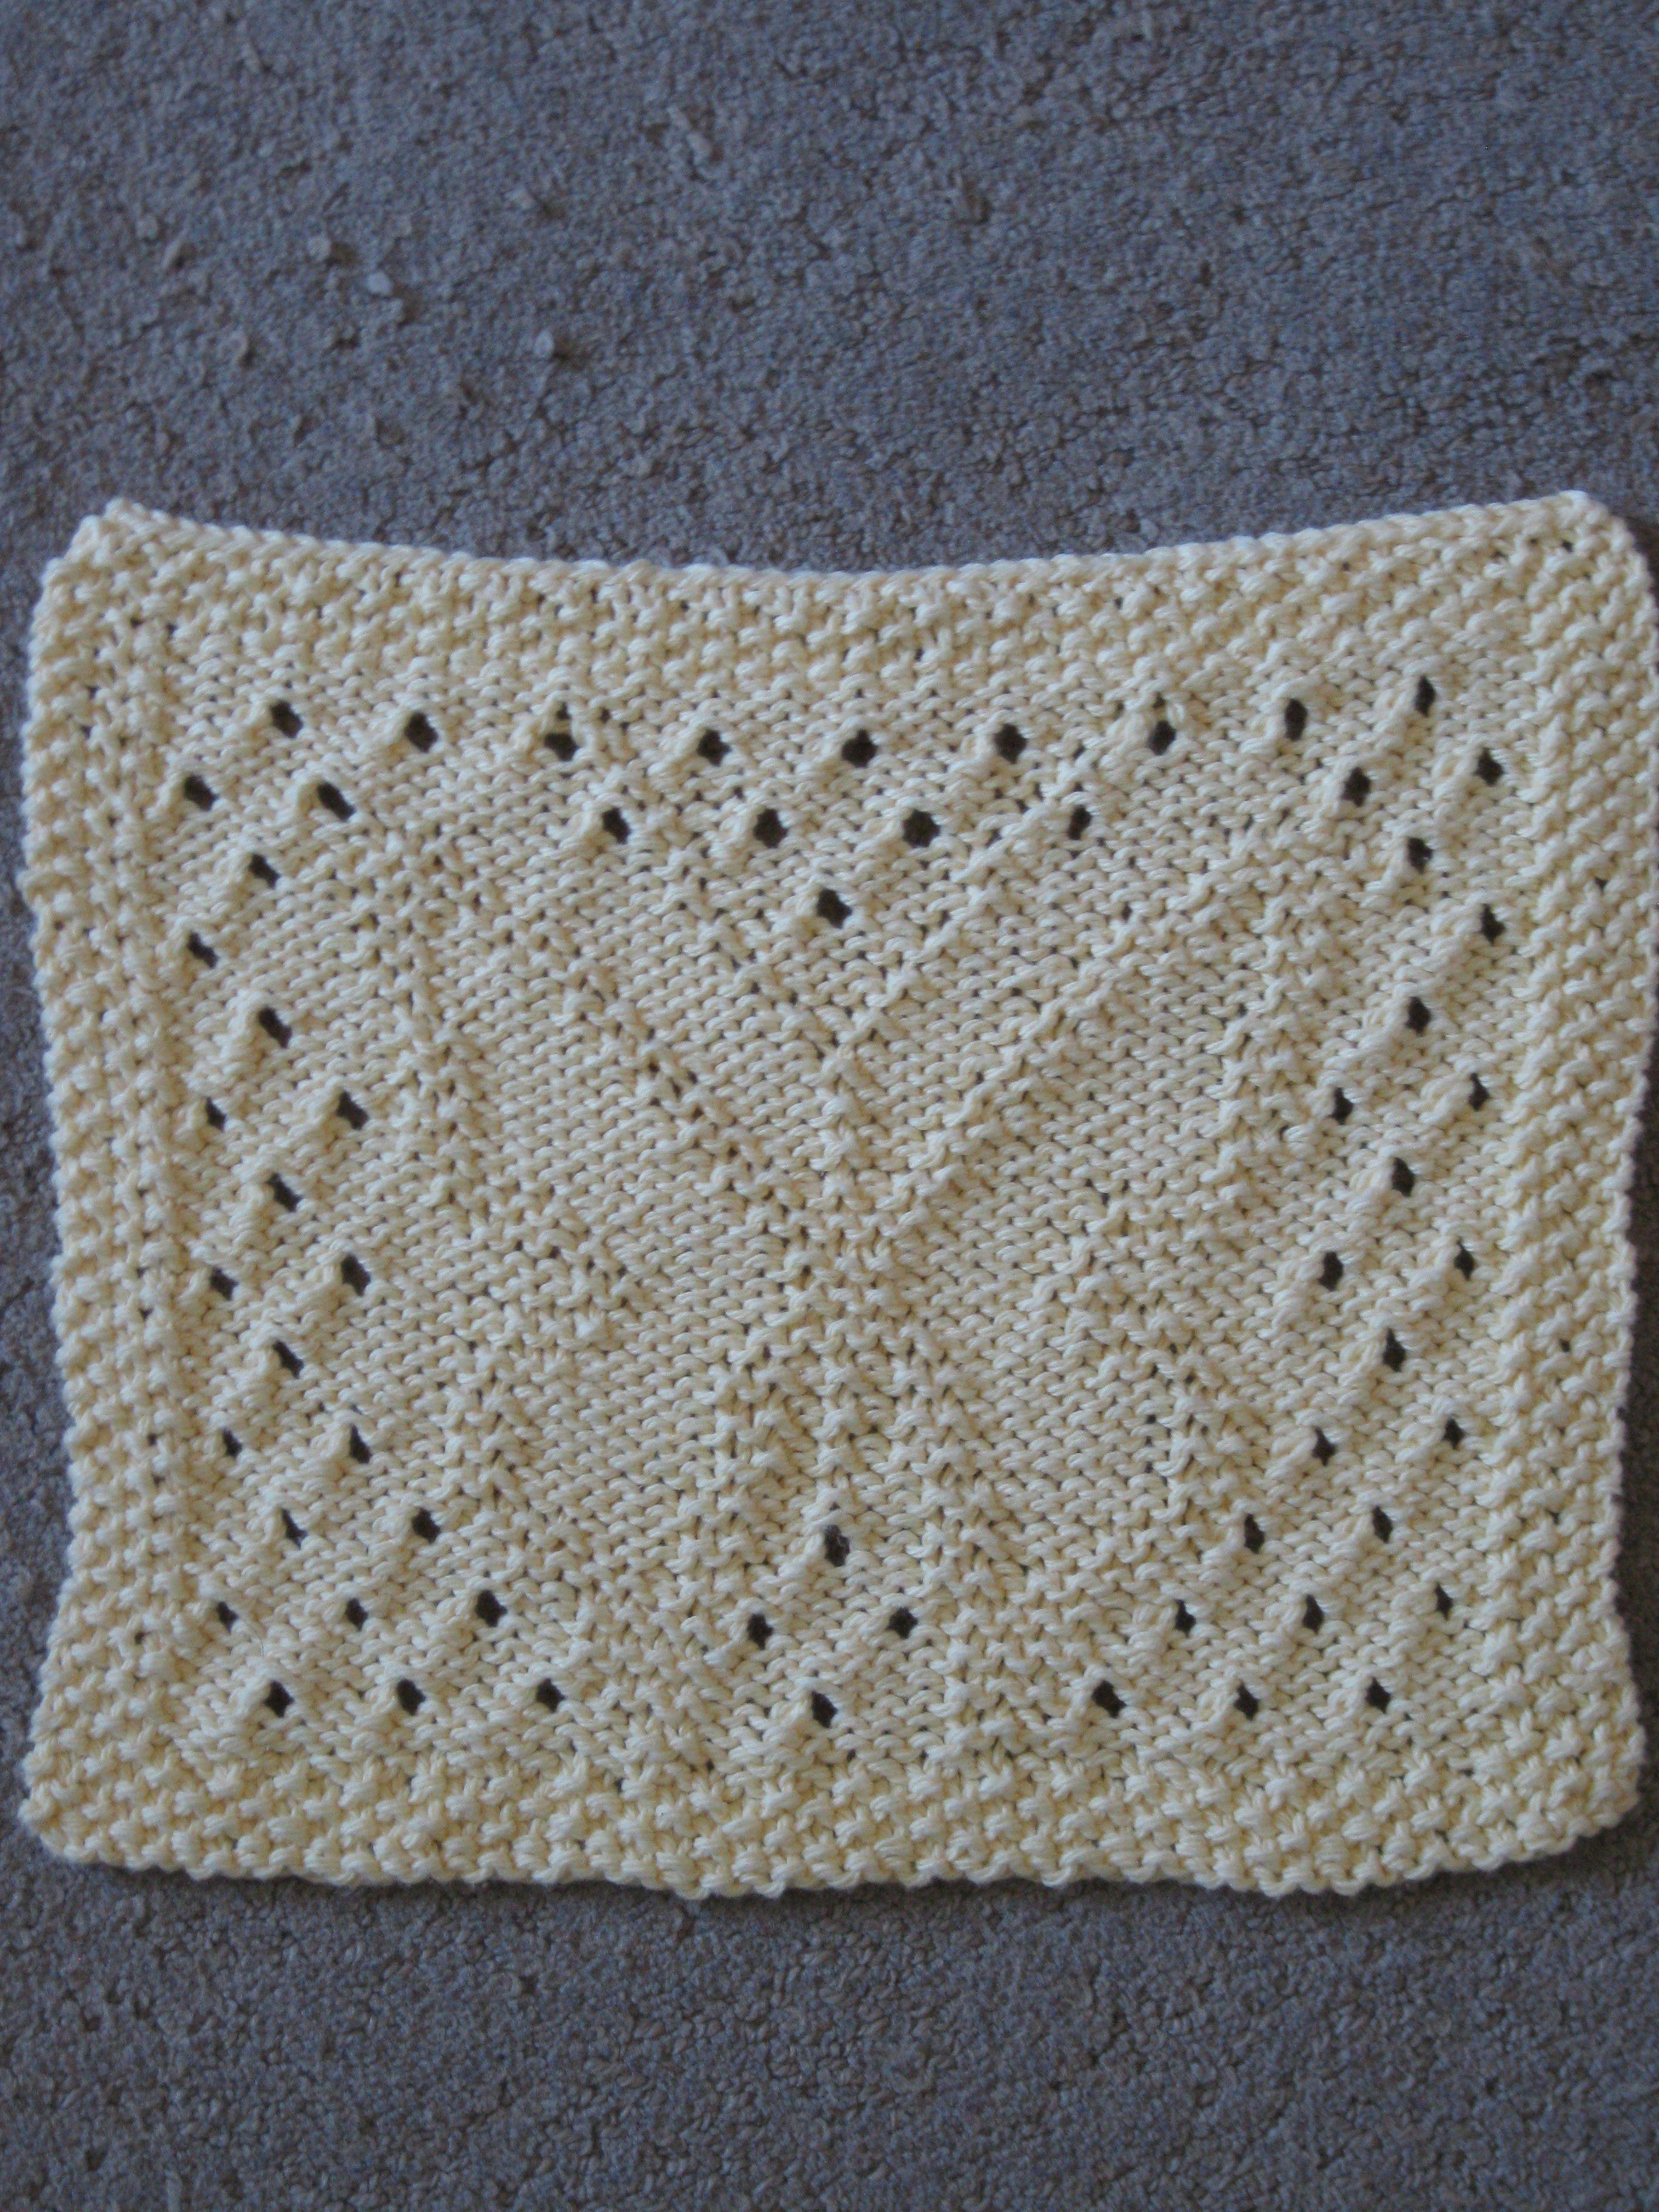 Knitted butterfly dishcloth | Knit dishcloth, Rugs, Bath mat